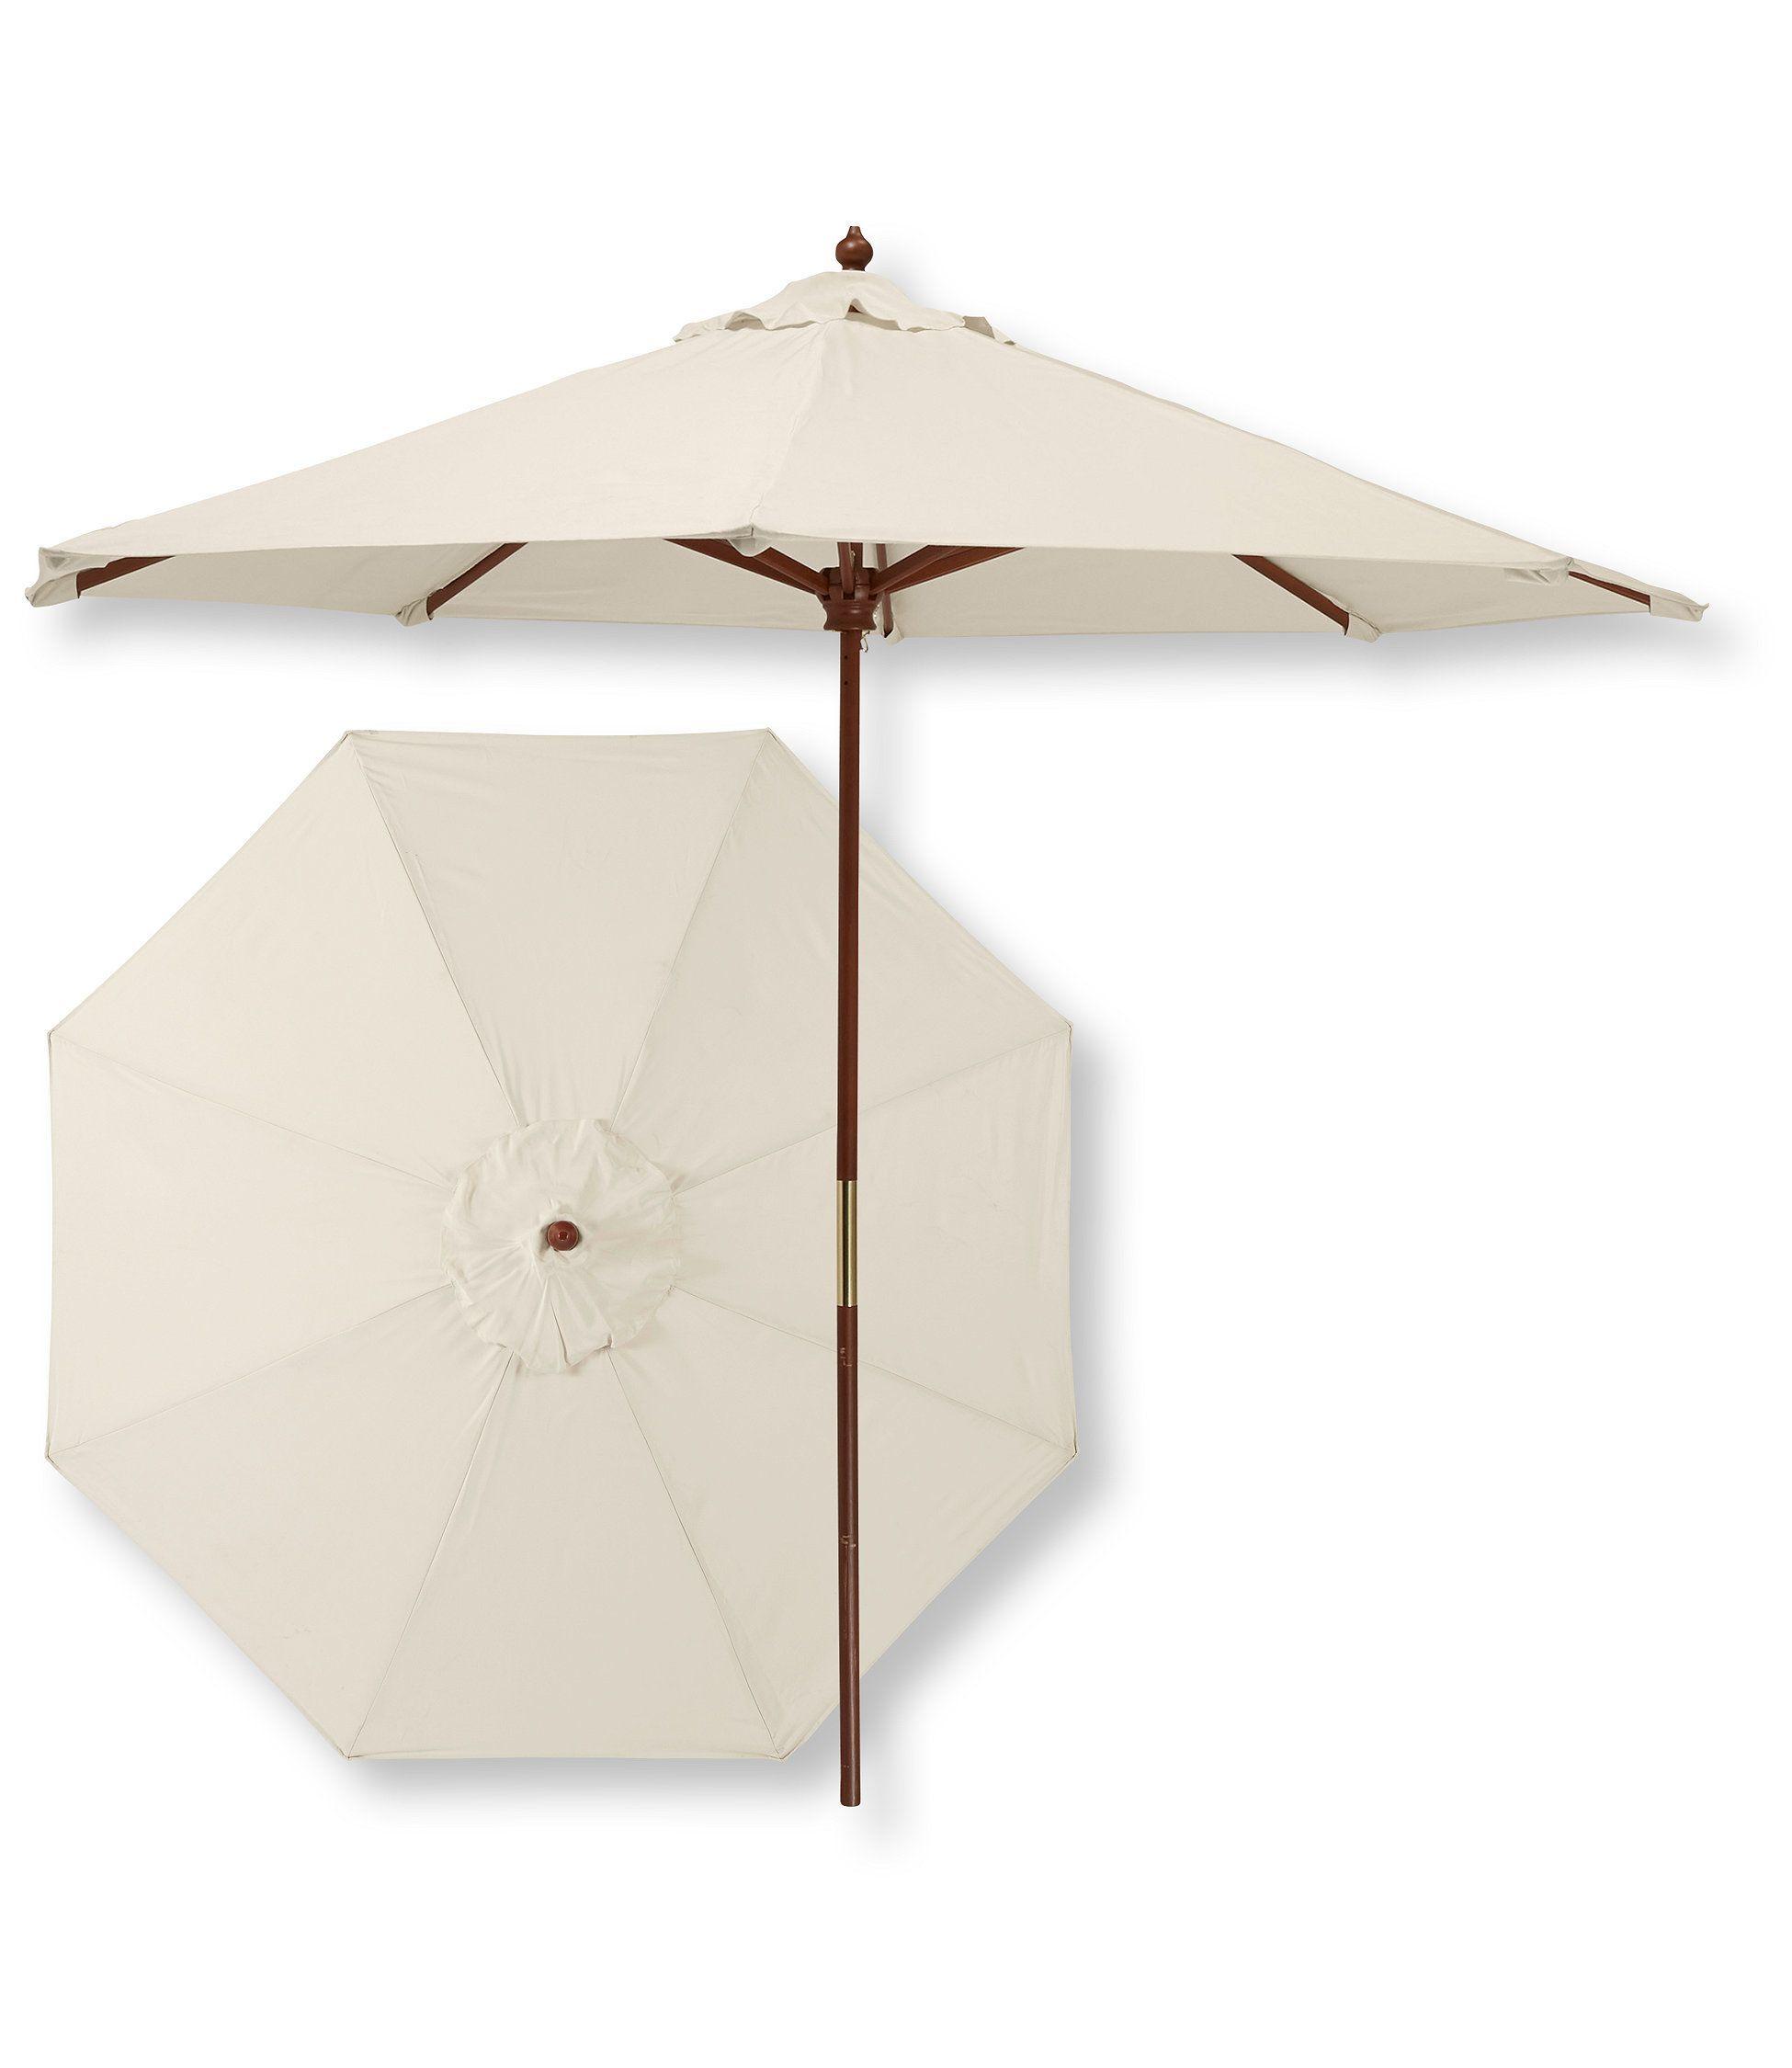 Treasure Garden Sunbrella Market Umbrella Market Umbrella